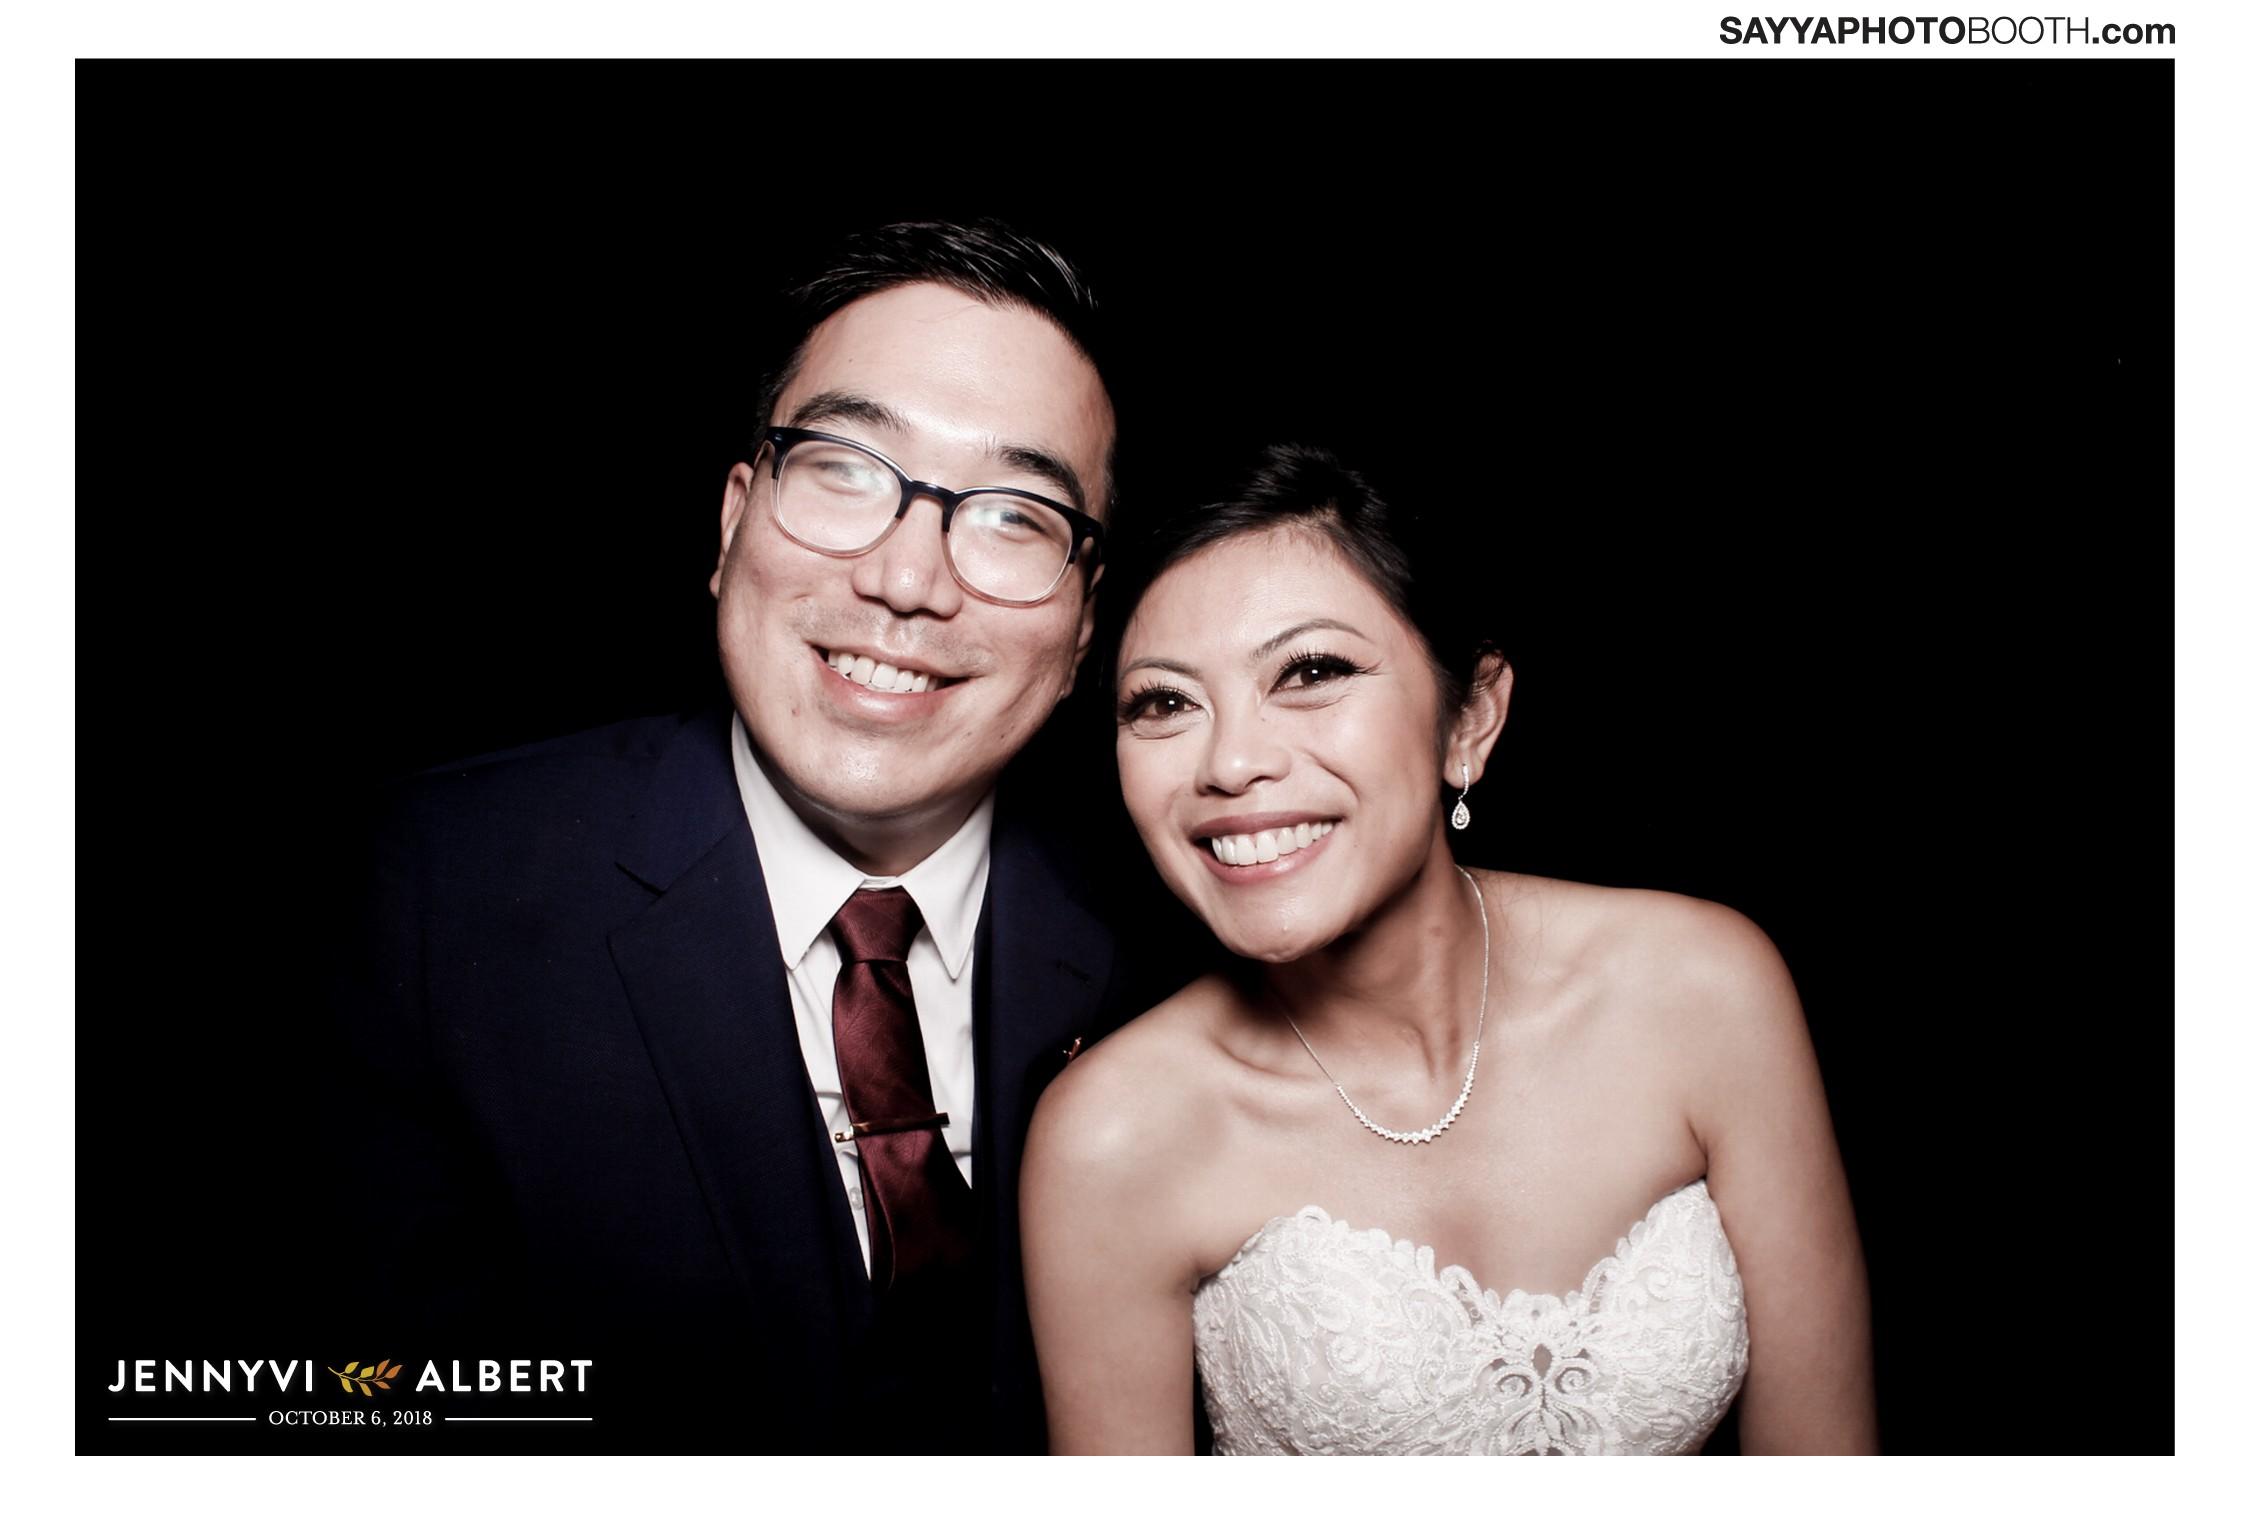 Jennyvi and Albert